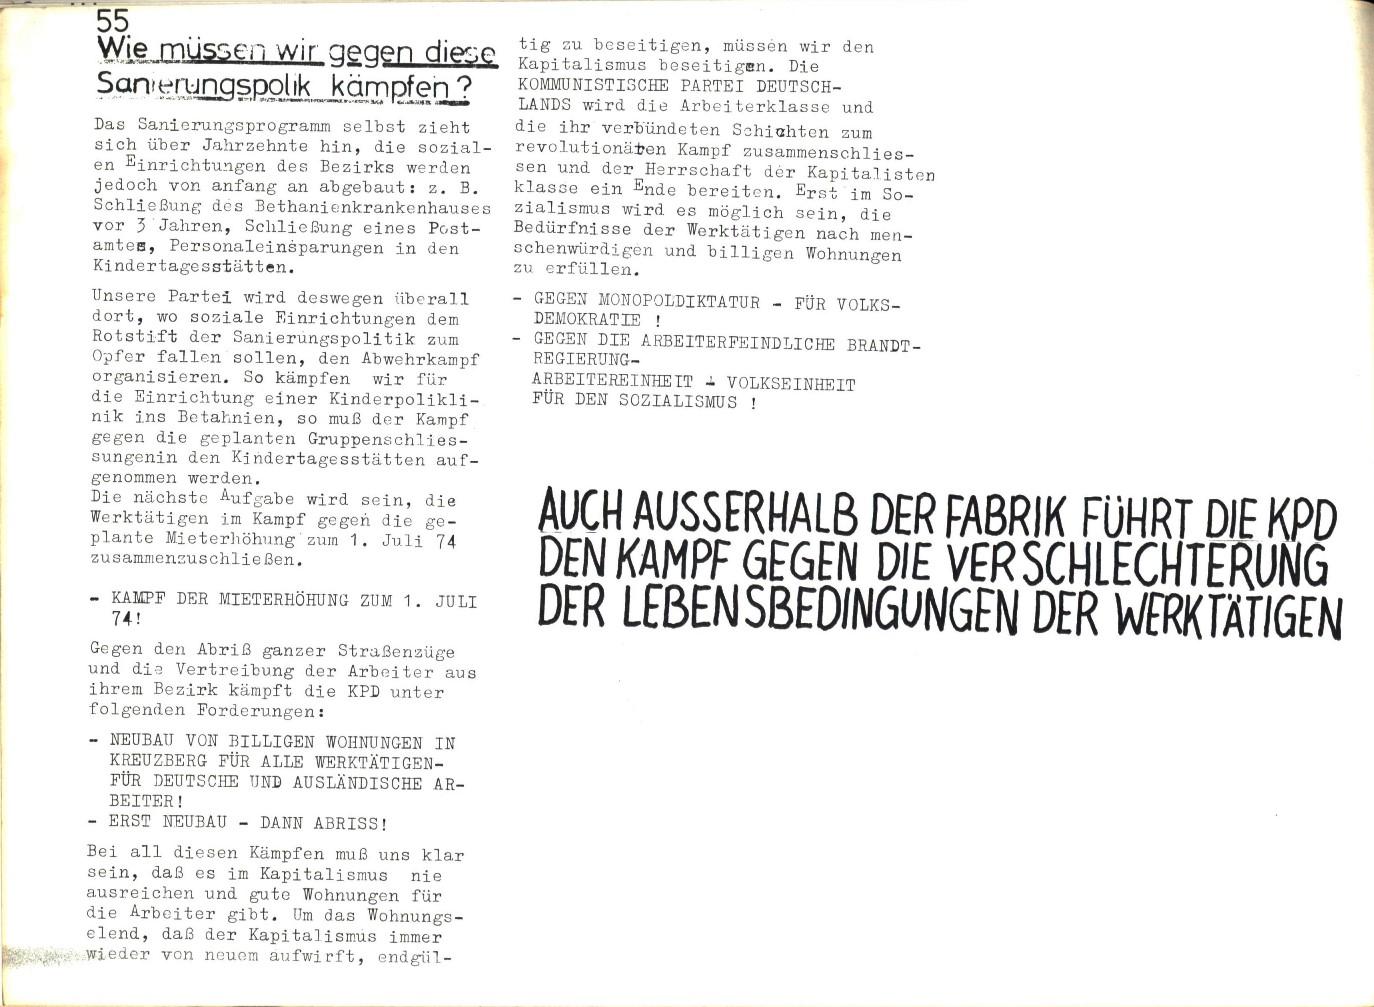 Berlin_KSV_1974_Rote_Bauwochen_72